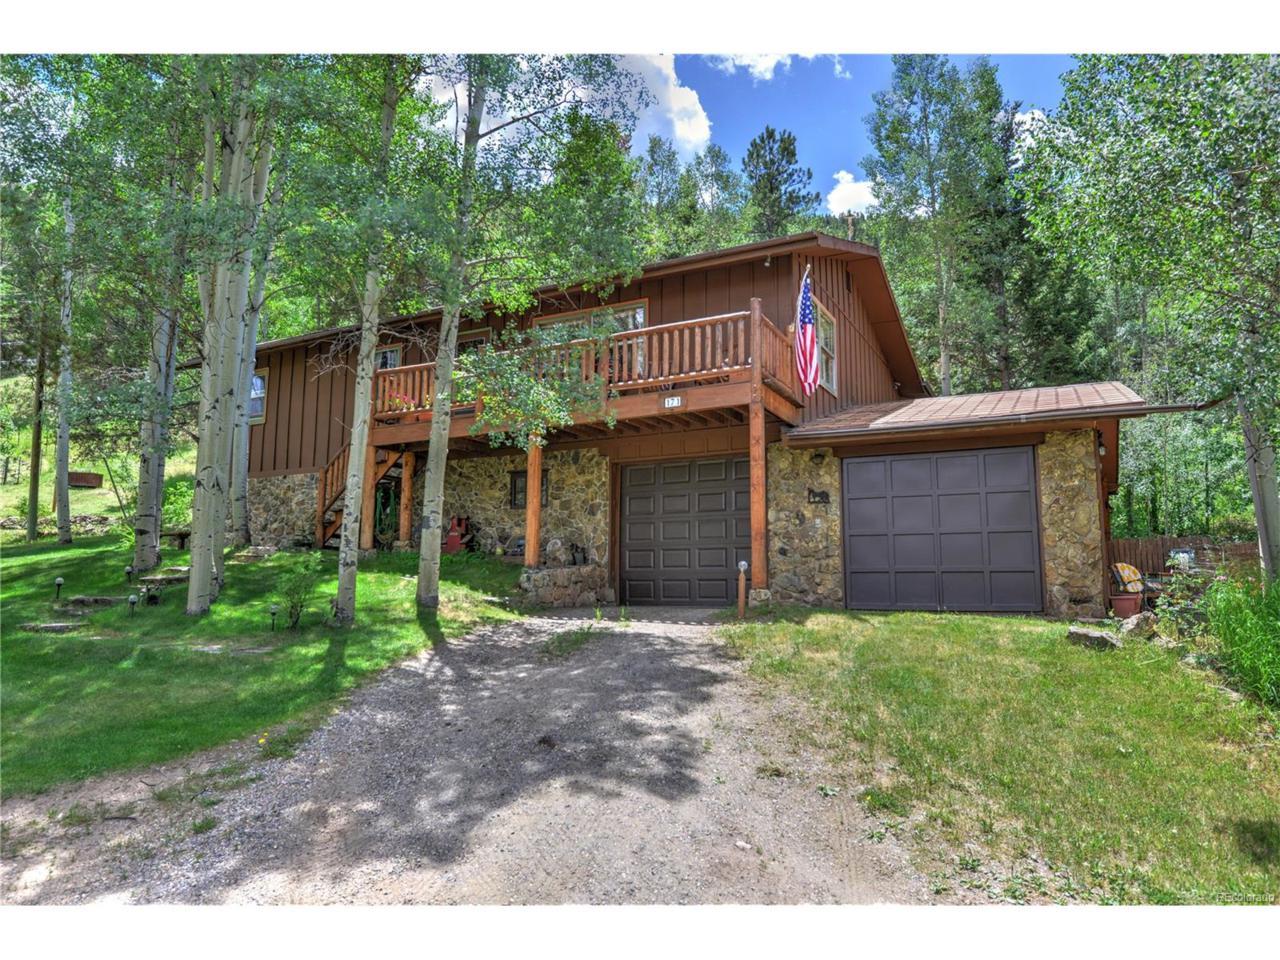 171 Buckskin Trail, Idaho Springs, CO 80452 (MLS #9398836) :: 8z Real Estate